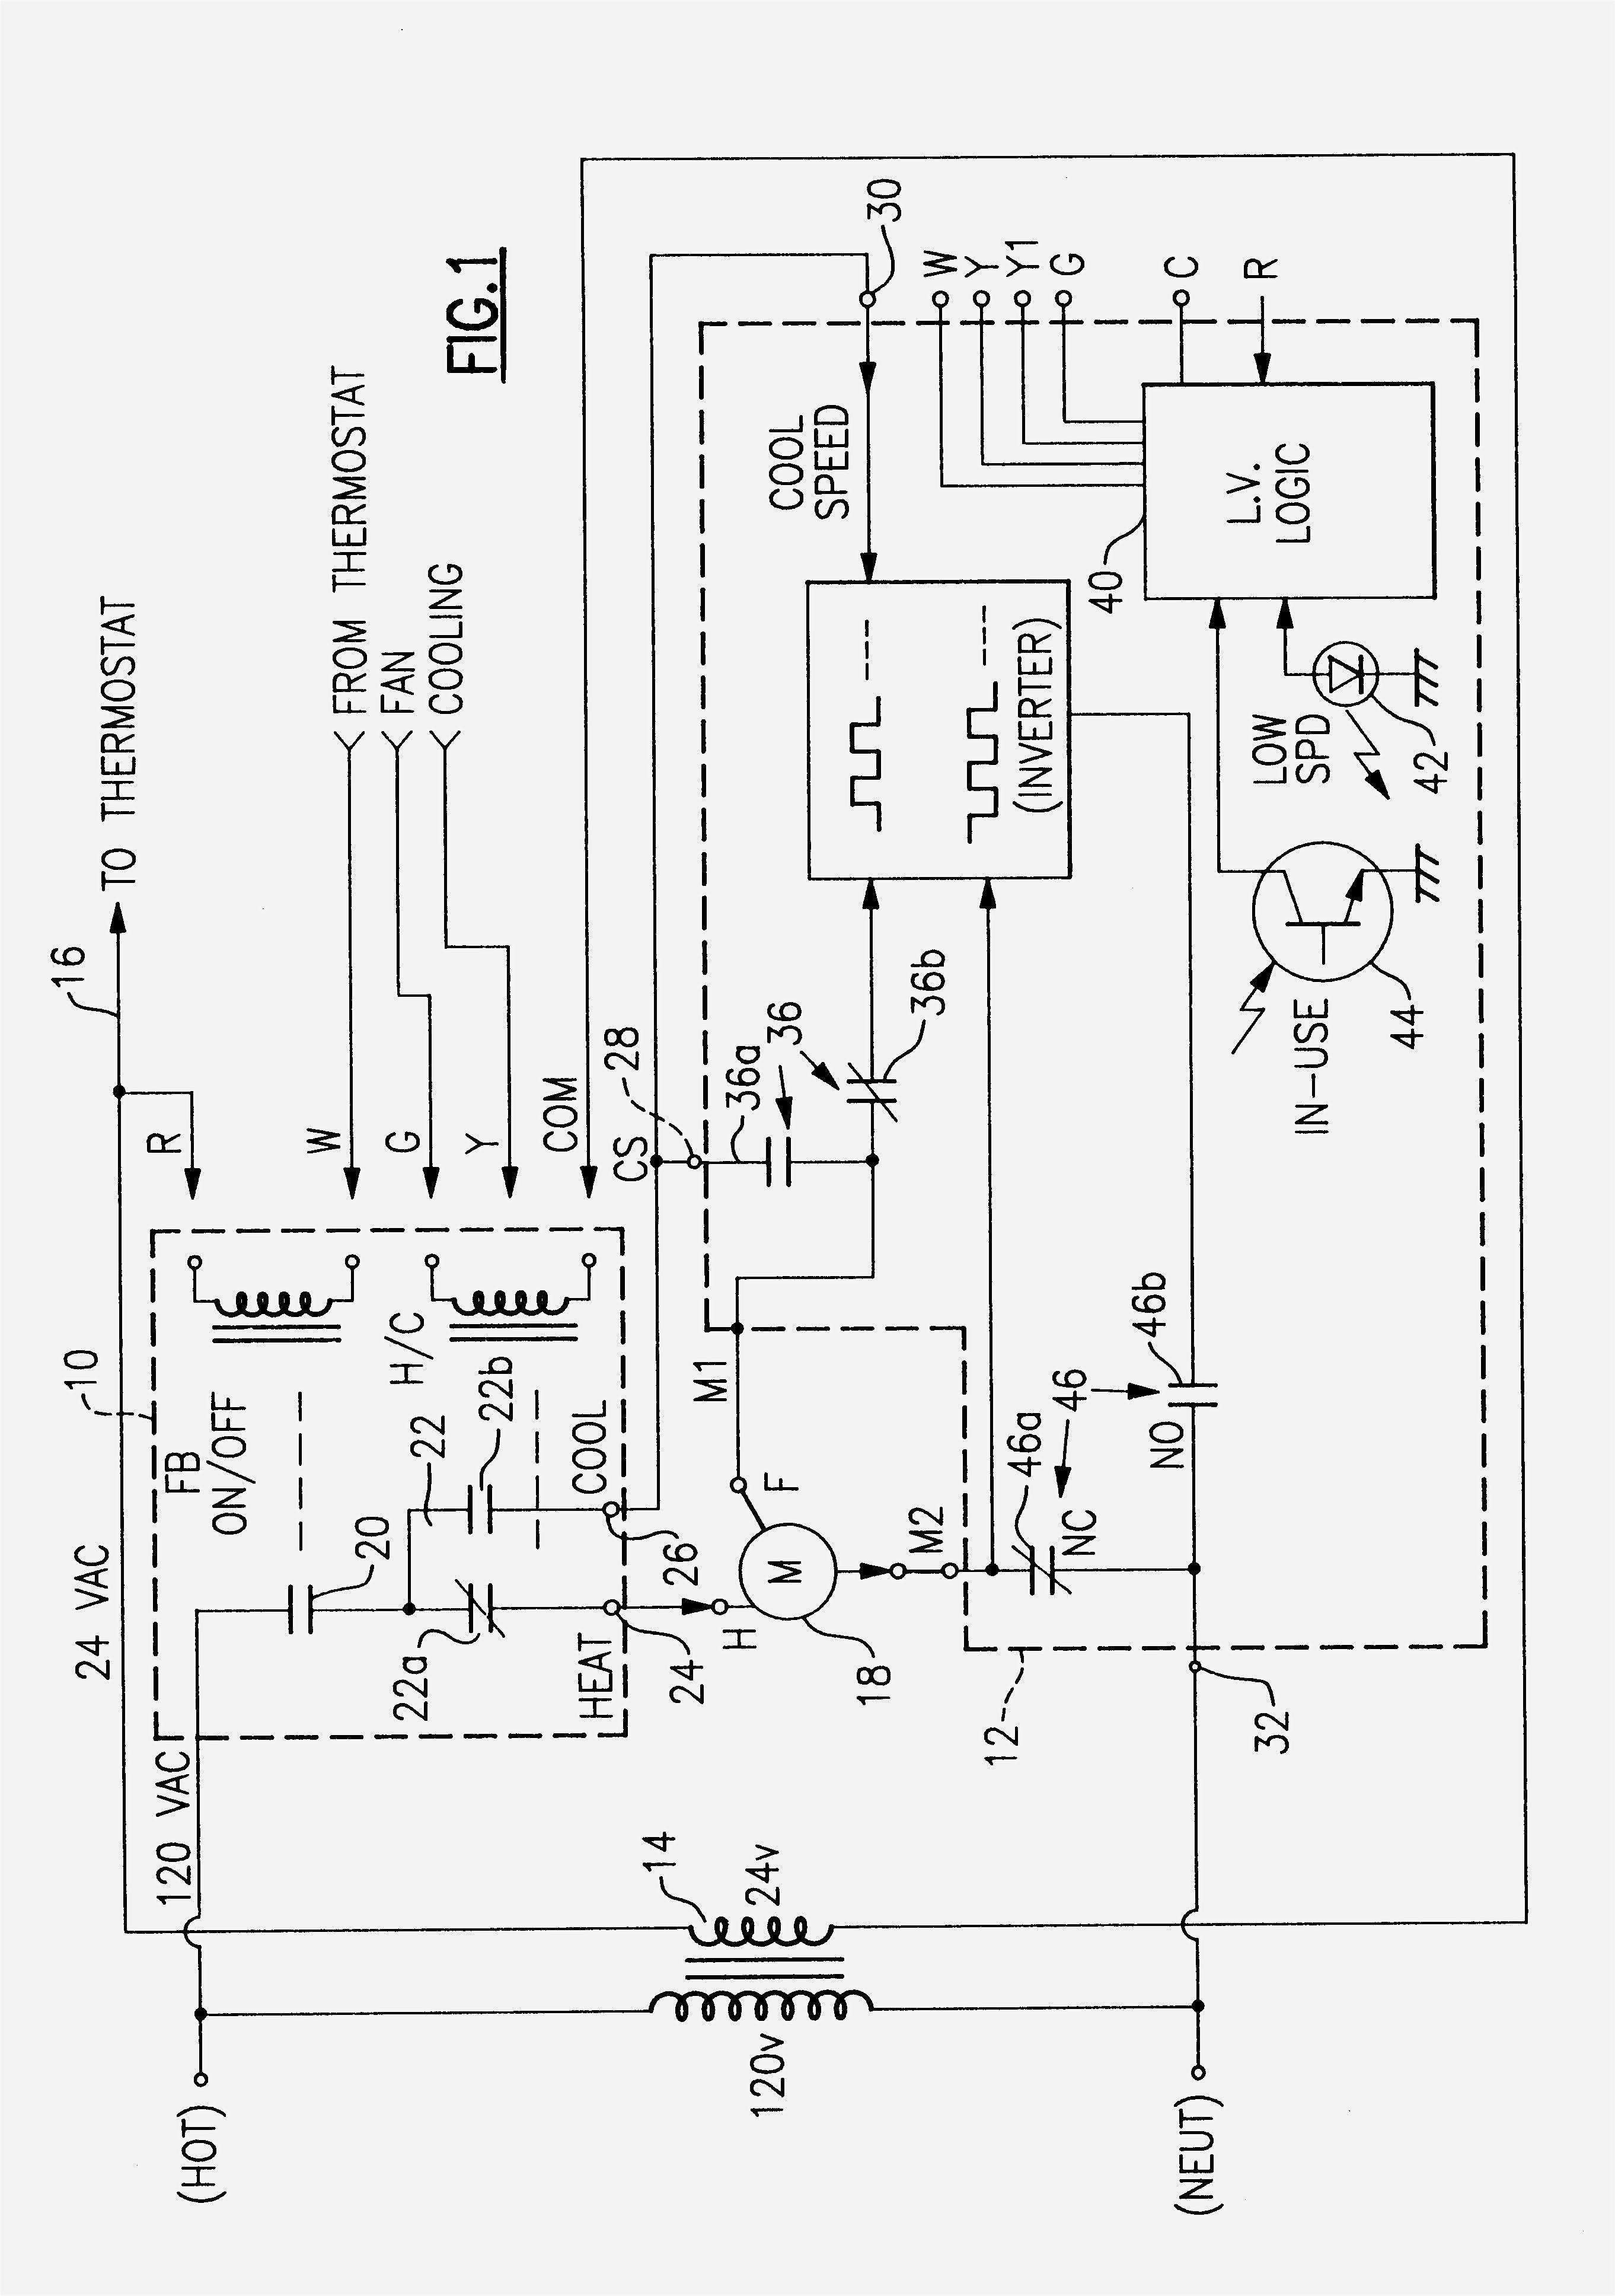 Great Wiring Diagram For 4l80e Transmission 4l80e At 4l80e